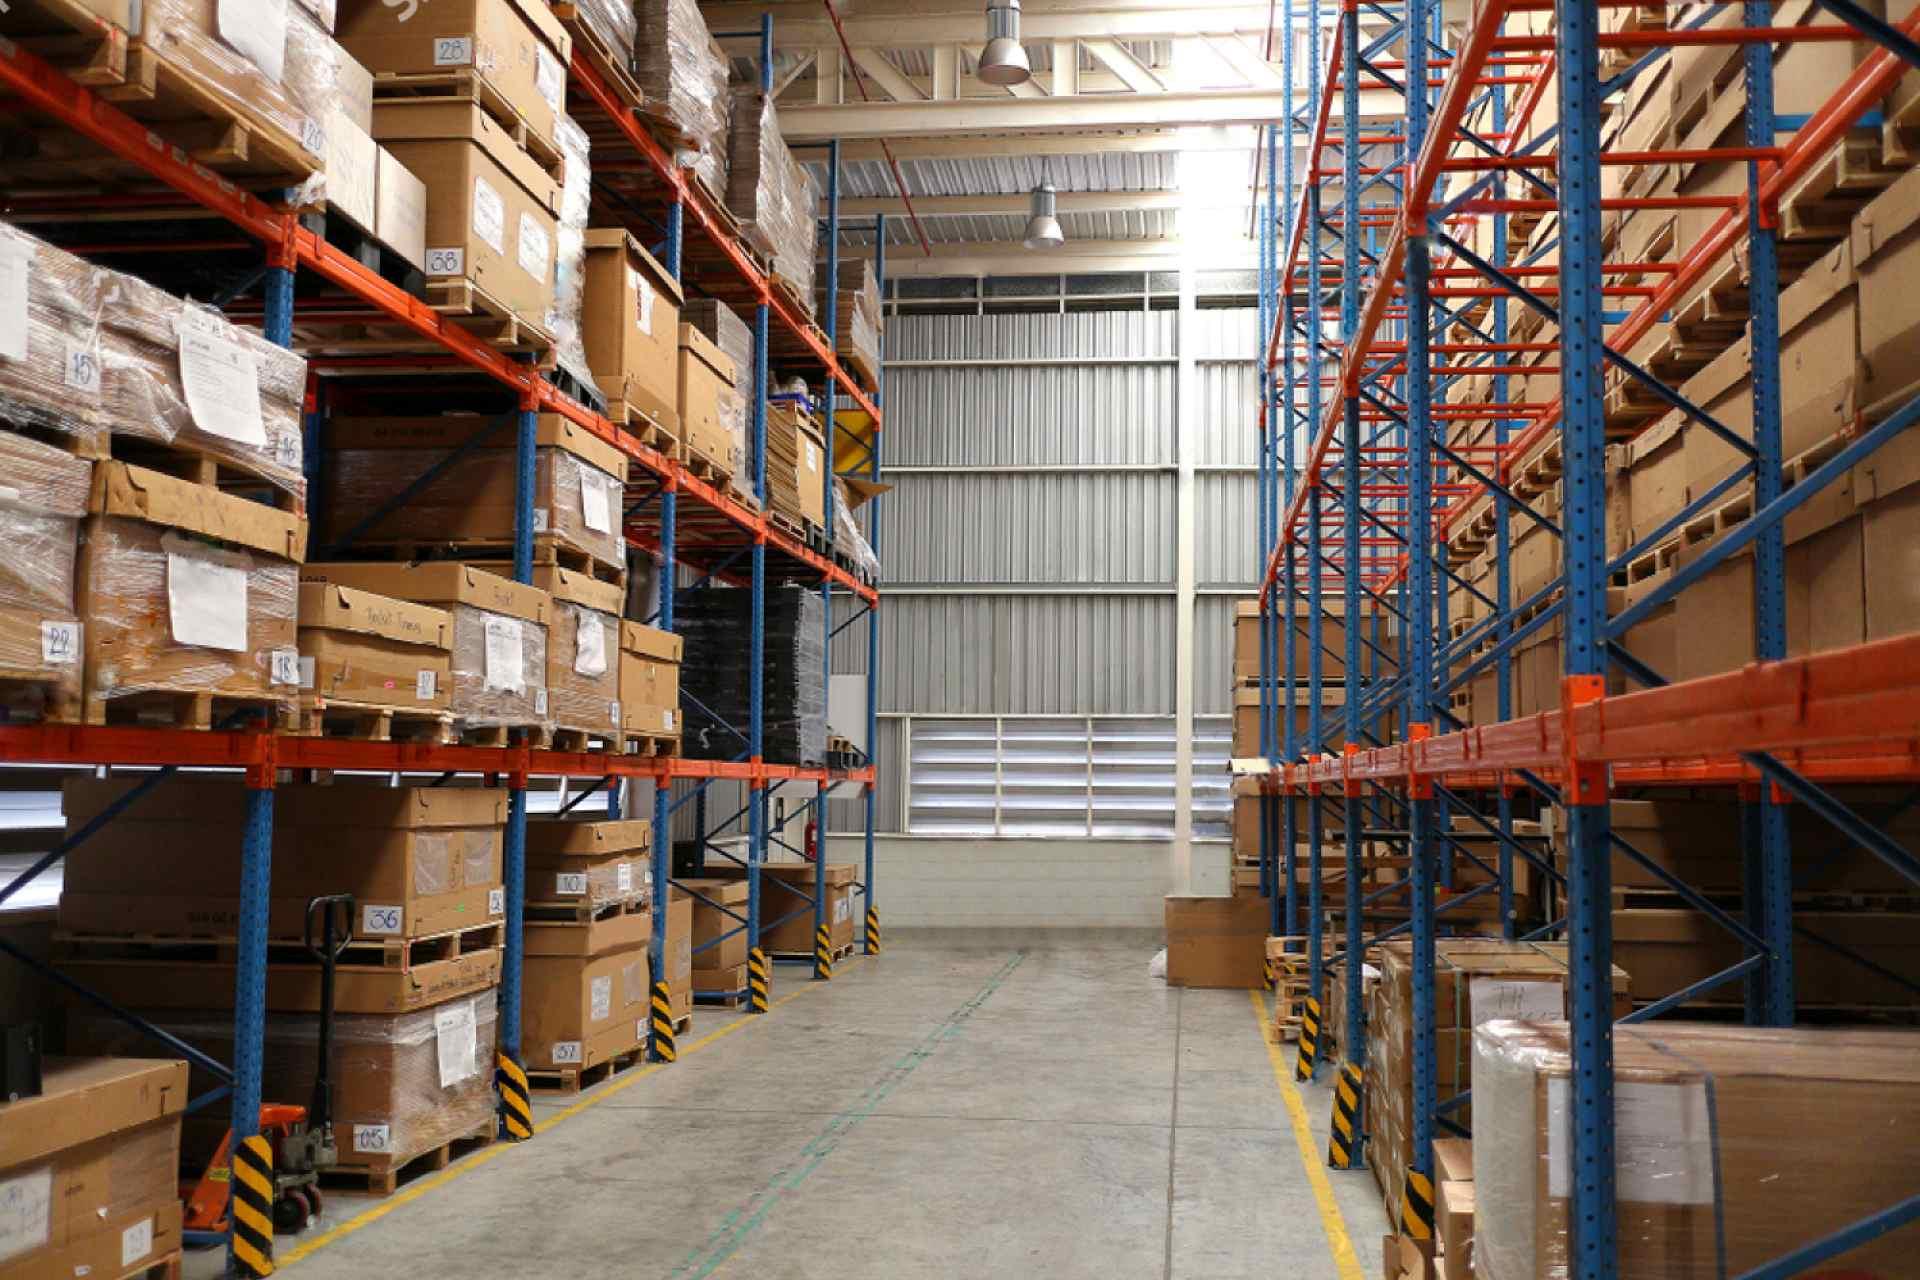 Ostraco - Ship Supplies warehouse, storage unit, storeroom, ship stores, marine warehouse